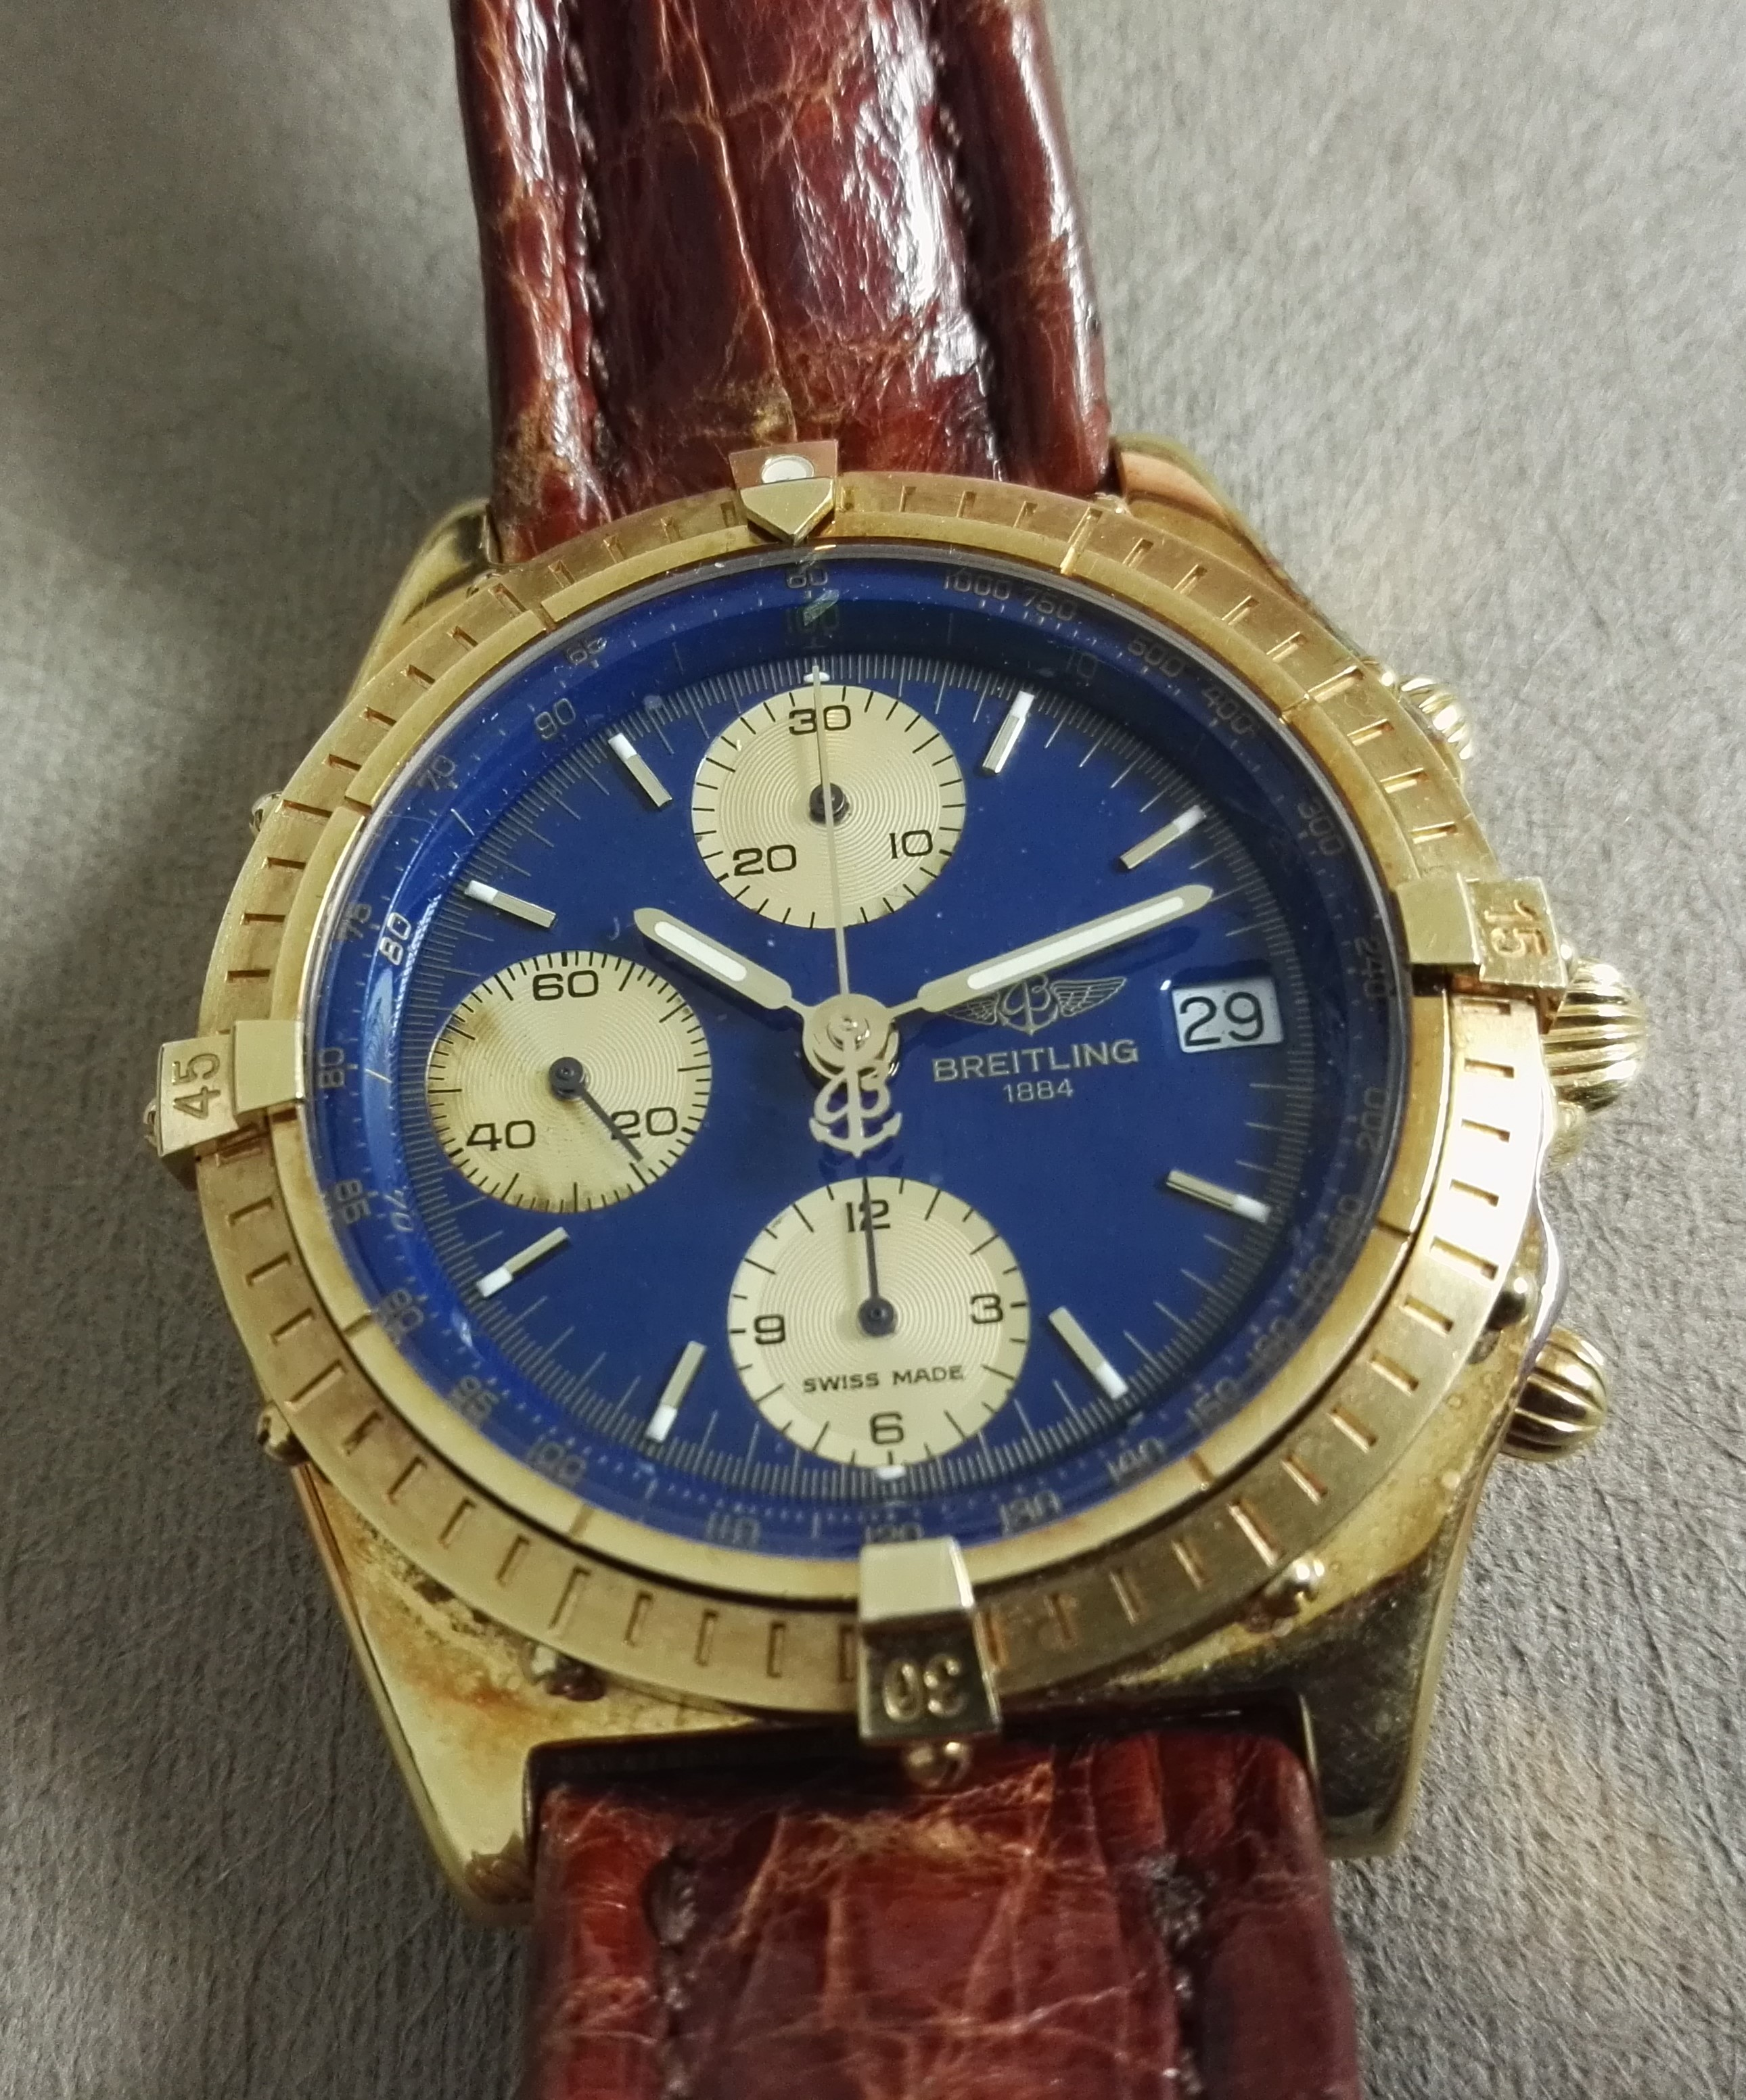 Breitling Chronomat Chronomat Chronograph Automatic 18k Gold K13047 Full Set   San Giorgio a Cremano